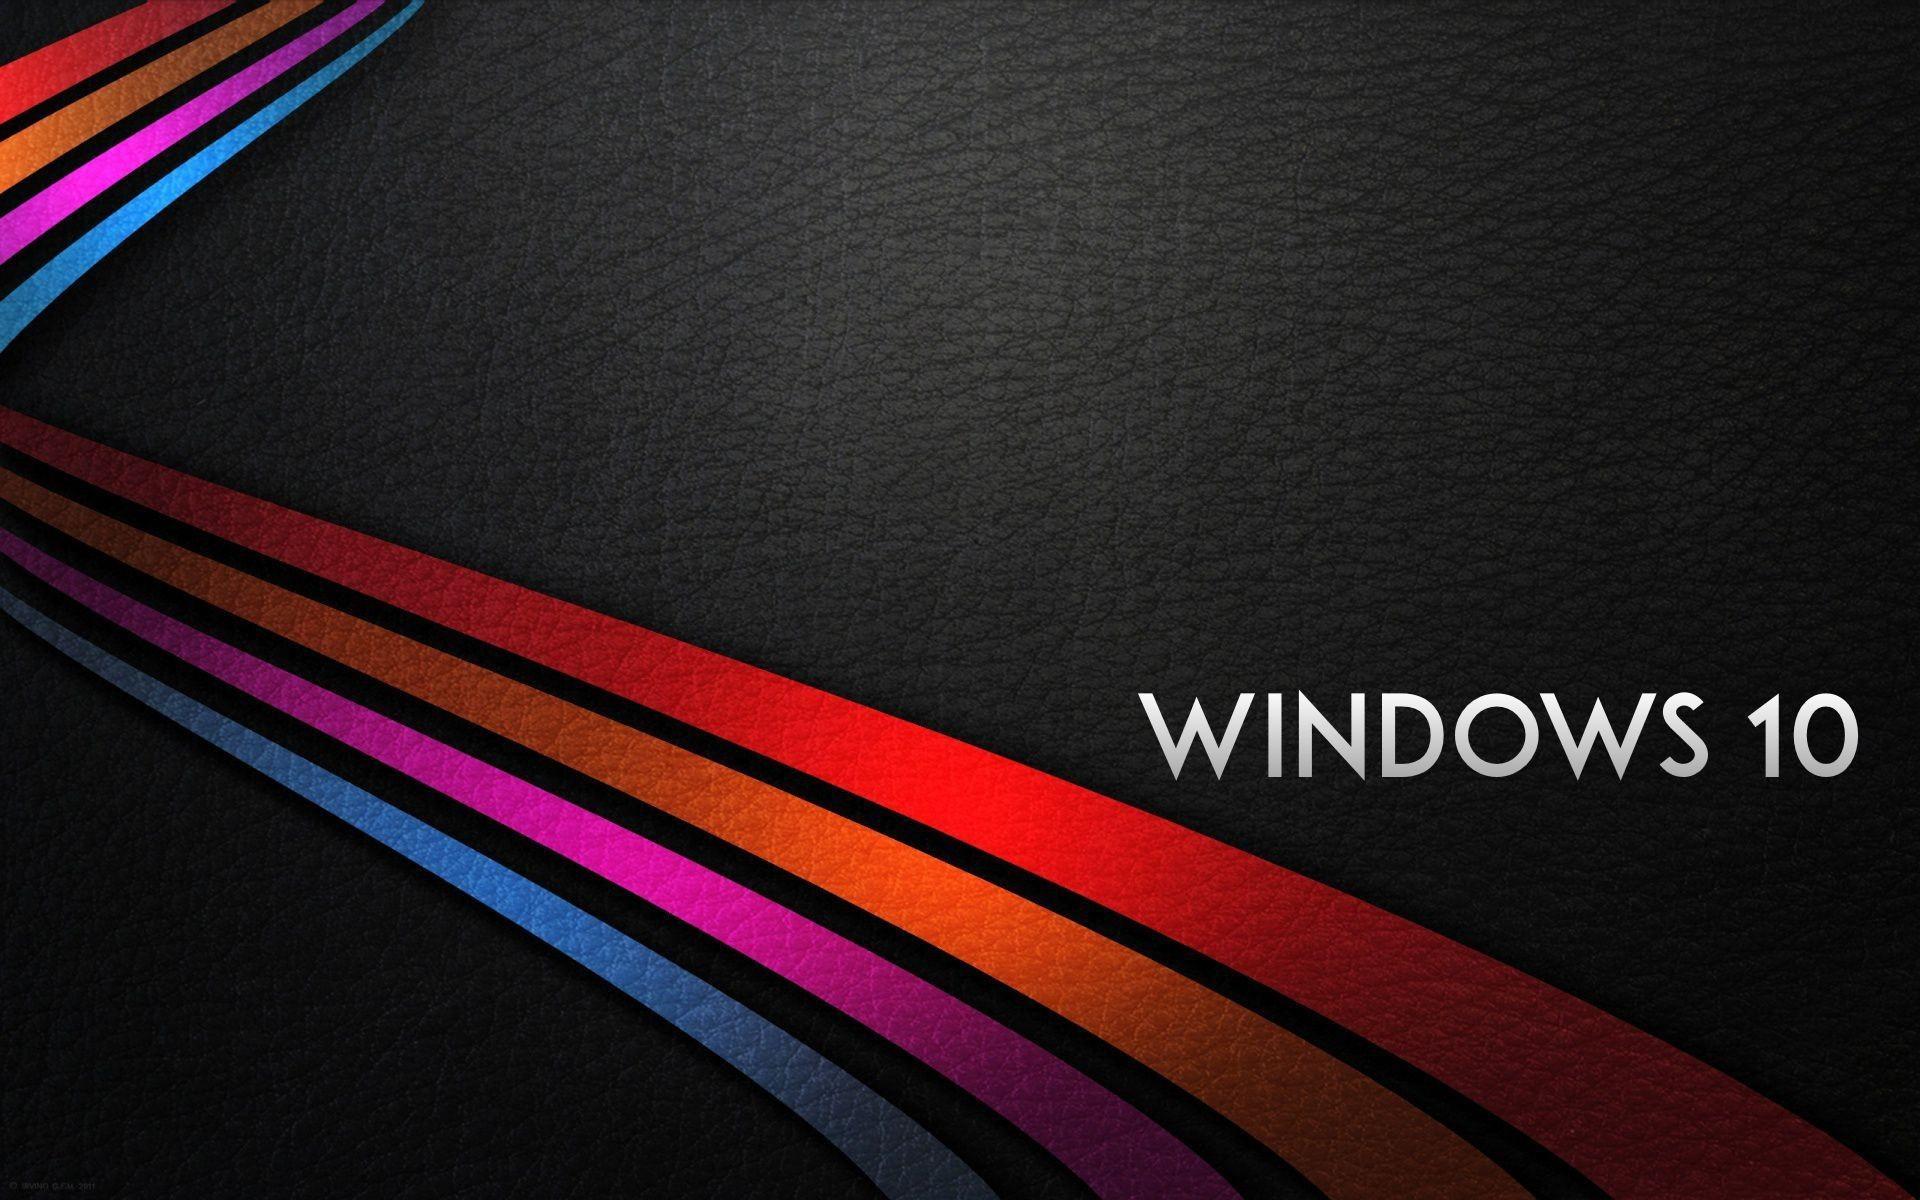 36 Windows 10 Hero Wallpaper 1080, Top Ranked Windows 10 Hero .